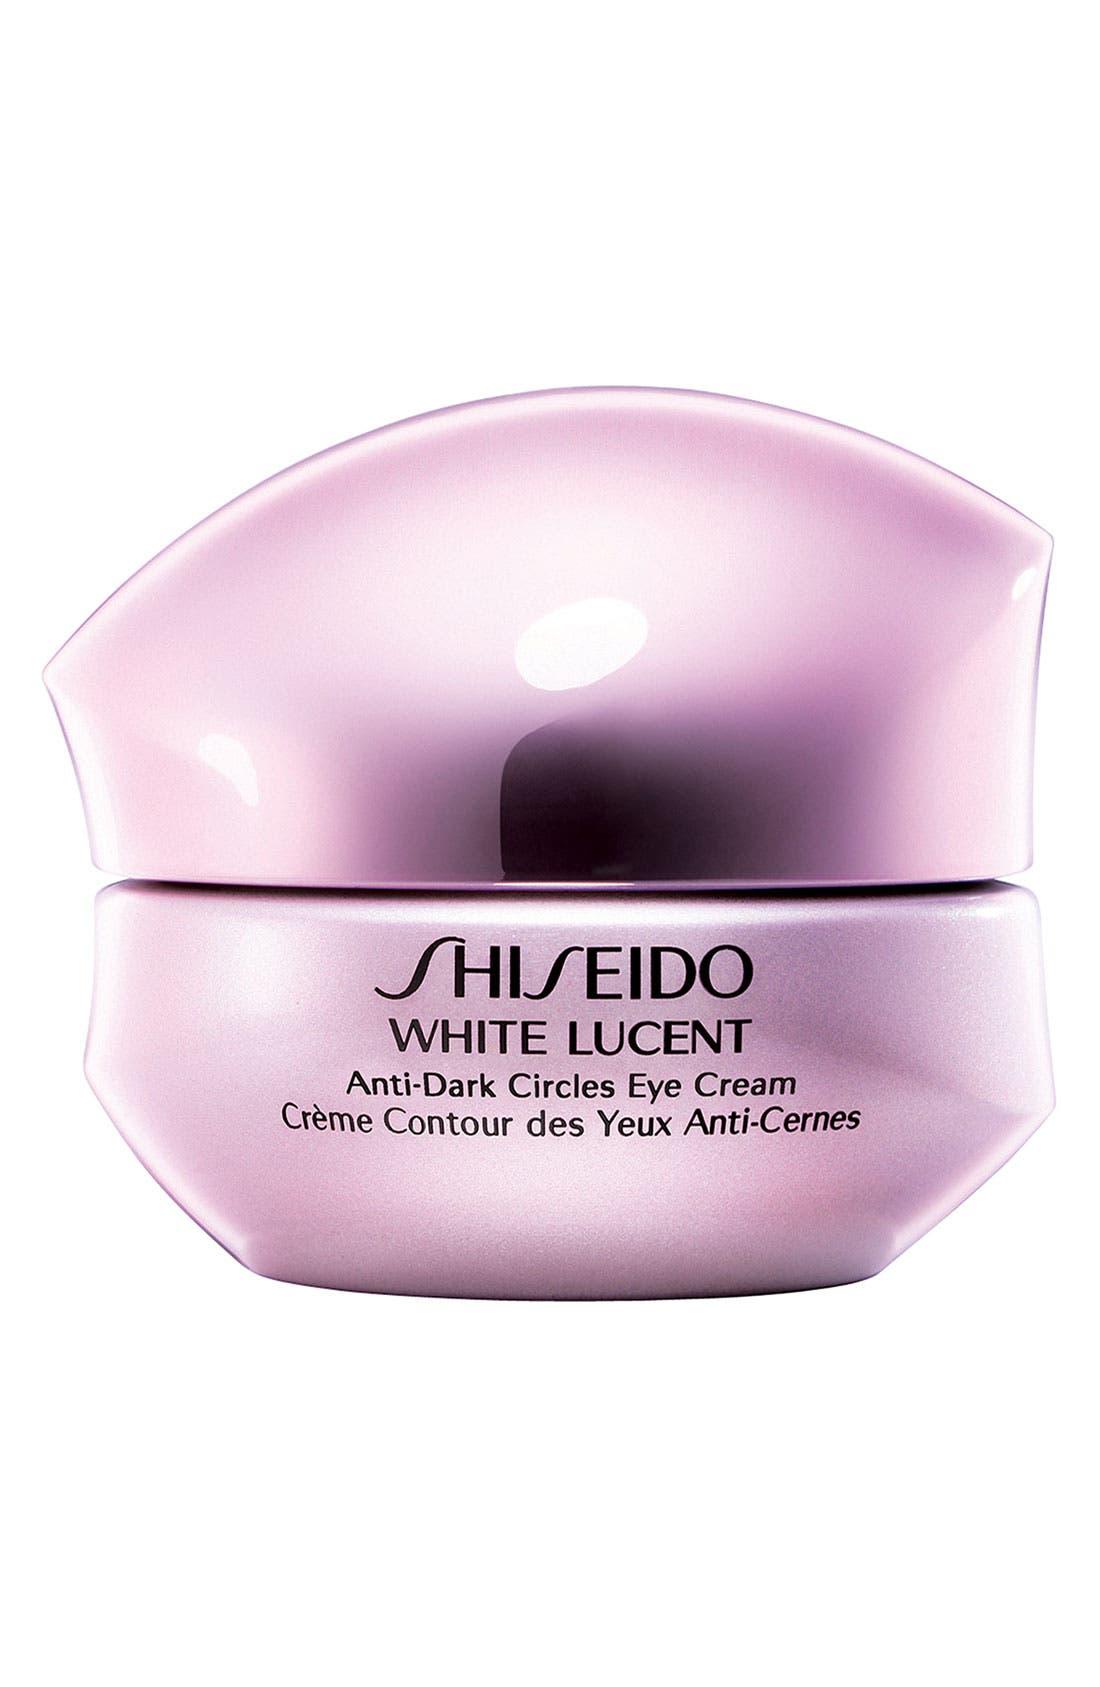 Shiseido 'White Lucent' Anti-Dark Circles Eye Cream